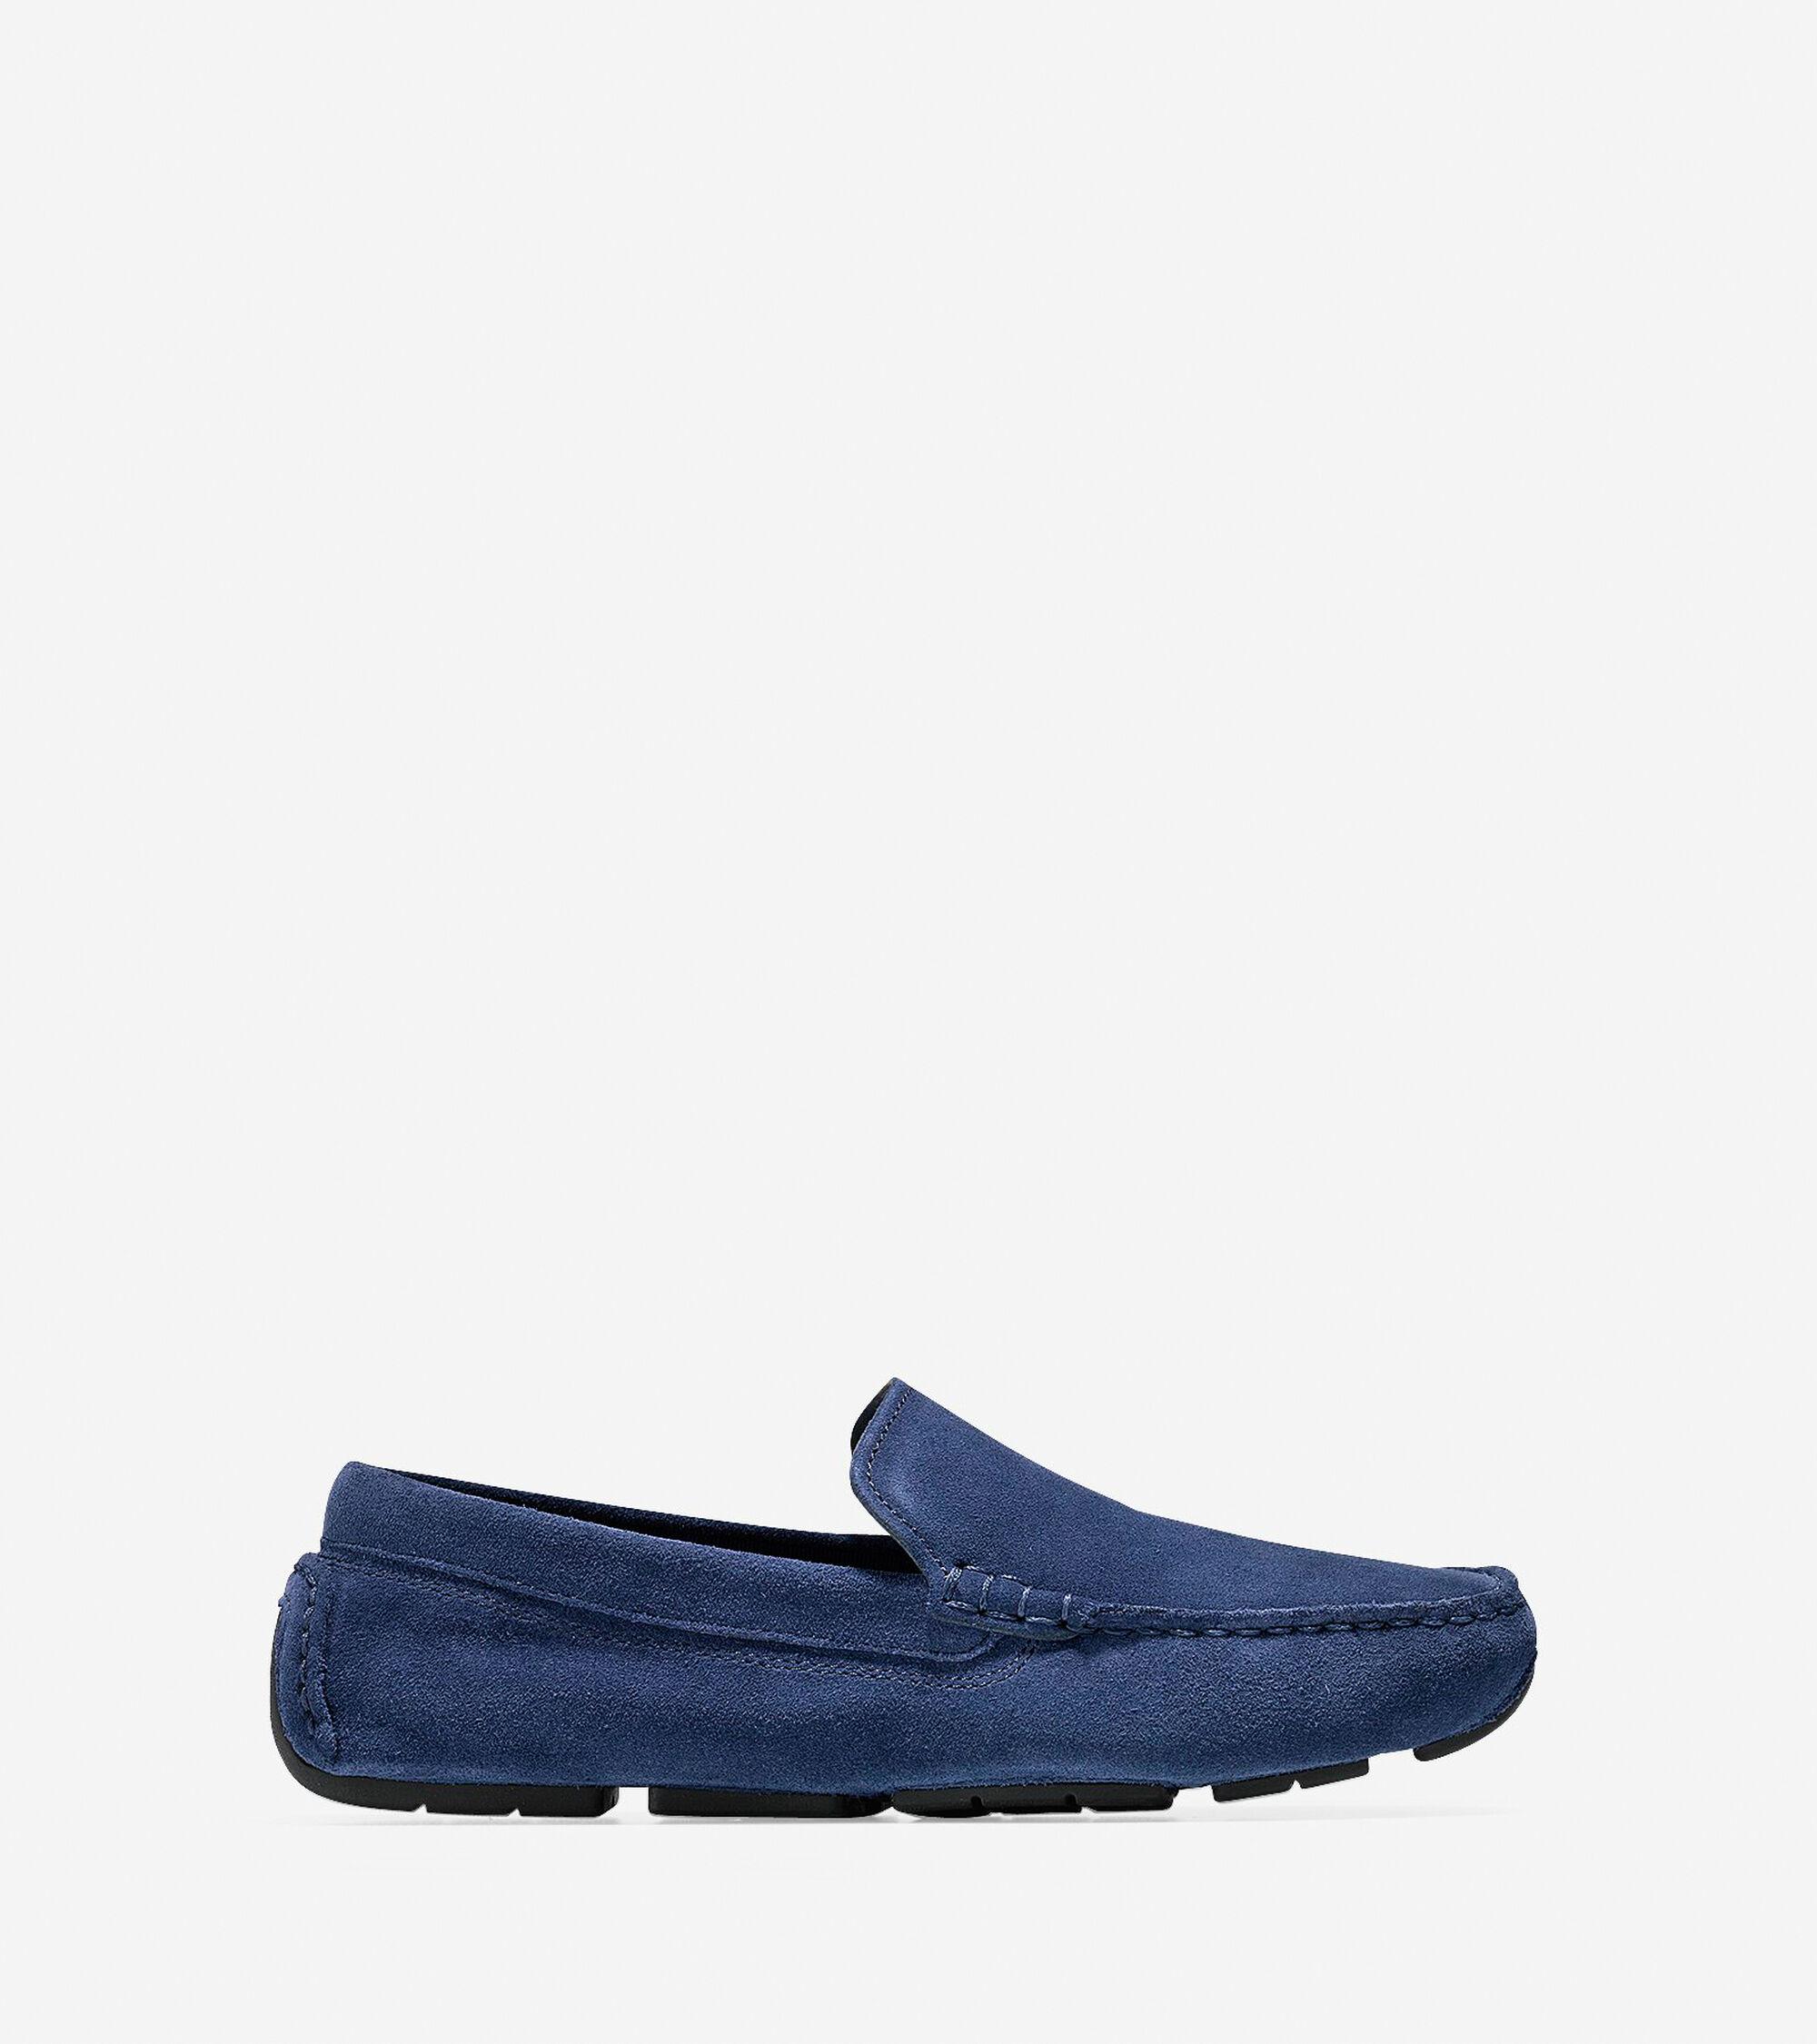 aaae09c7263 Kelson Venetian Loafers in Blazer Blue Suede